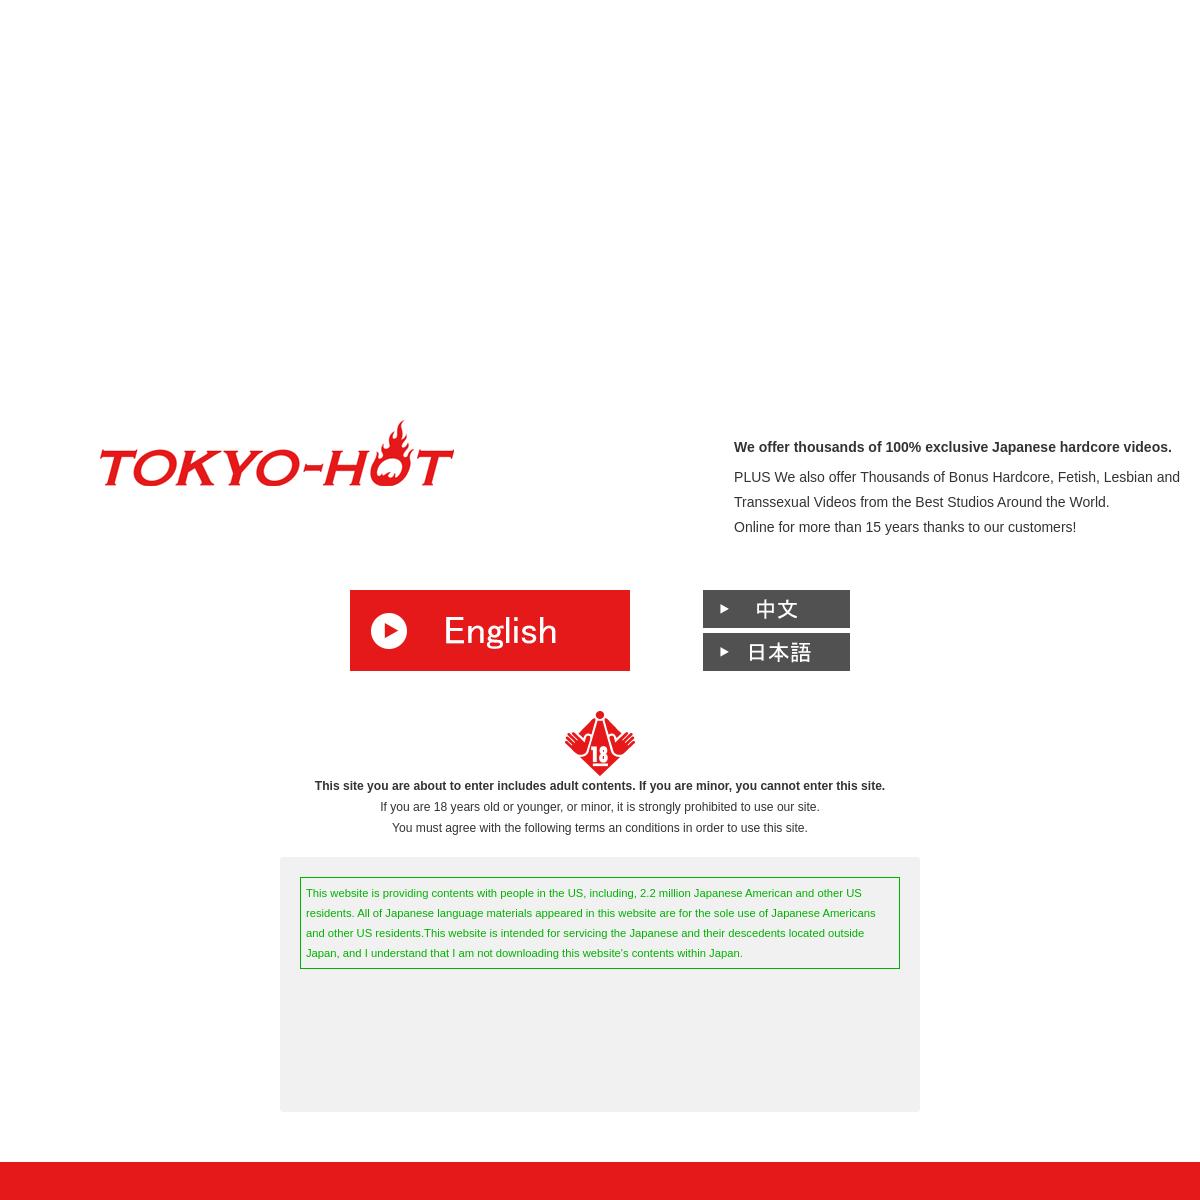 A complete backup of www.tokyo-hot.com